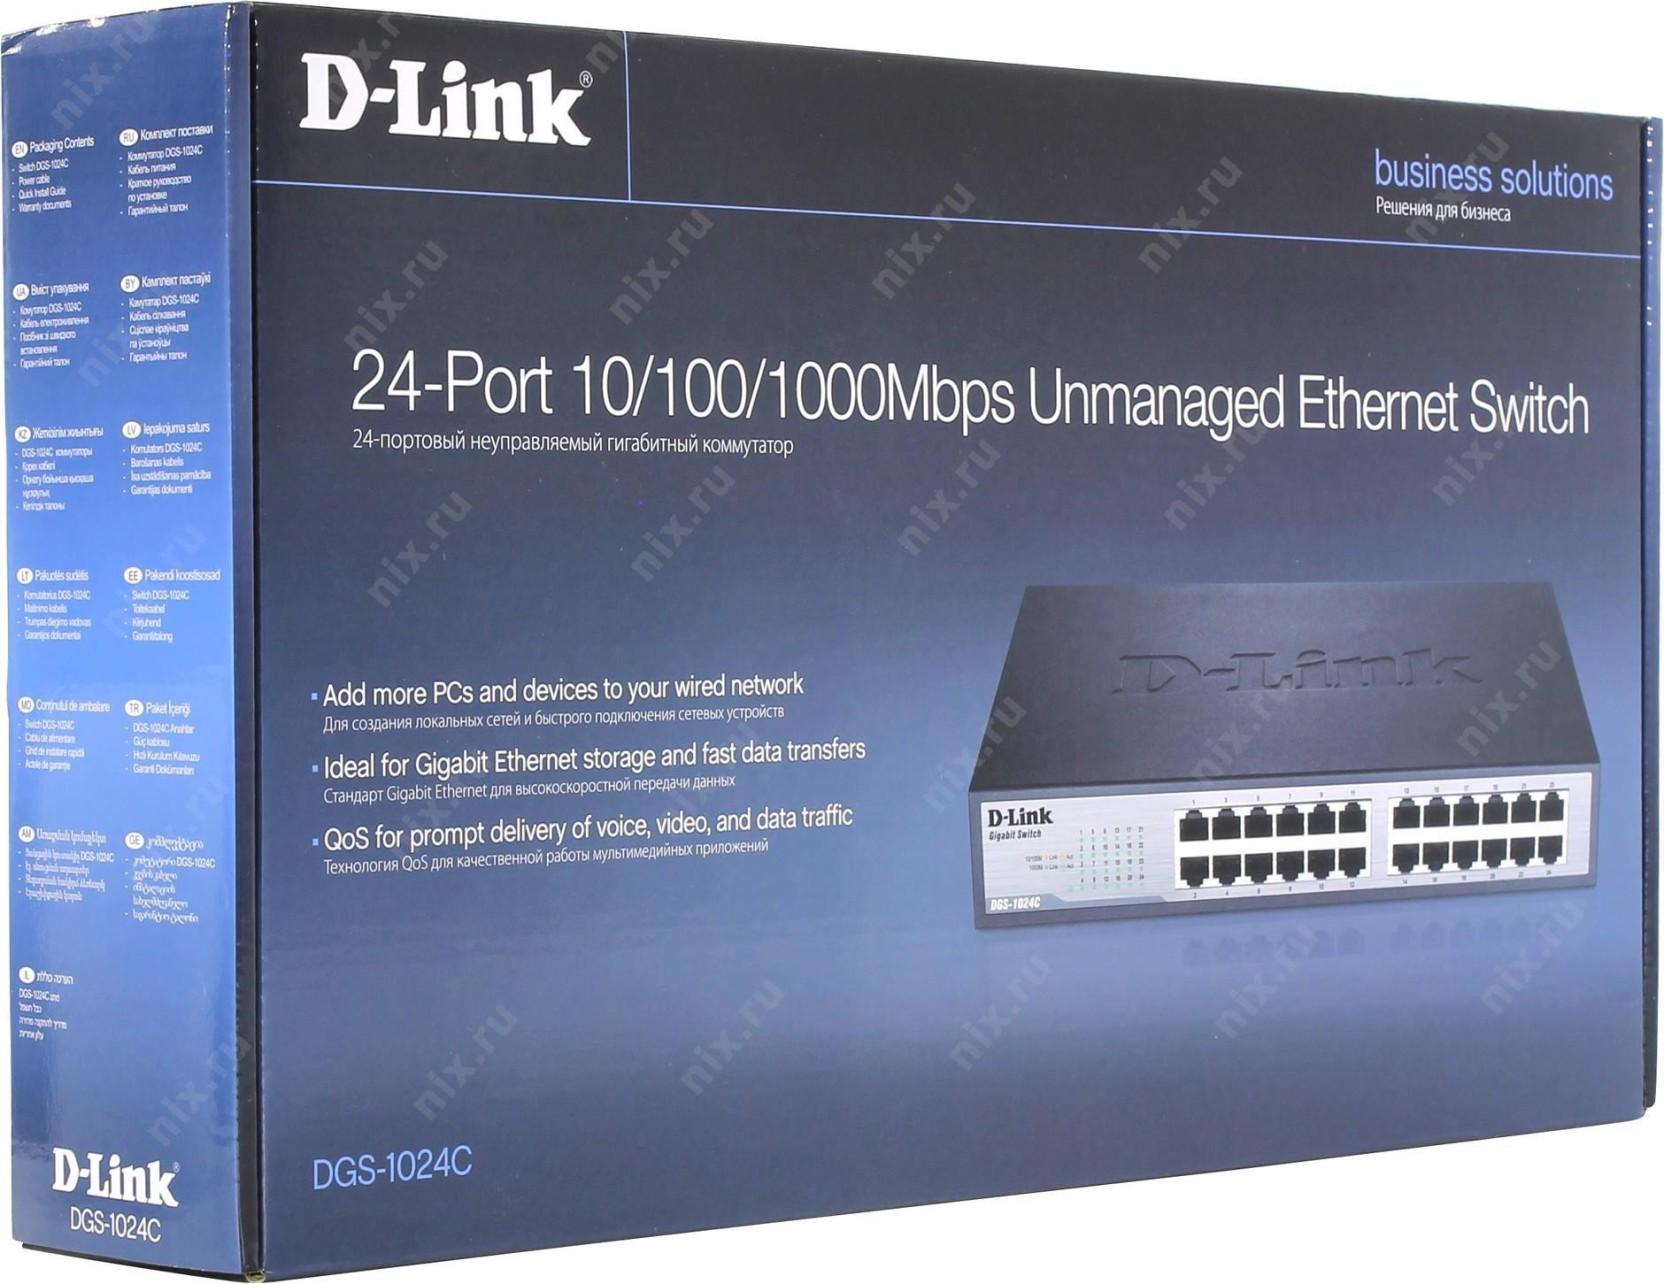 D Link Dgs 1024c Network Switch Smart 1210 10 E Add To Cart